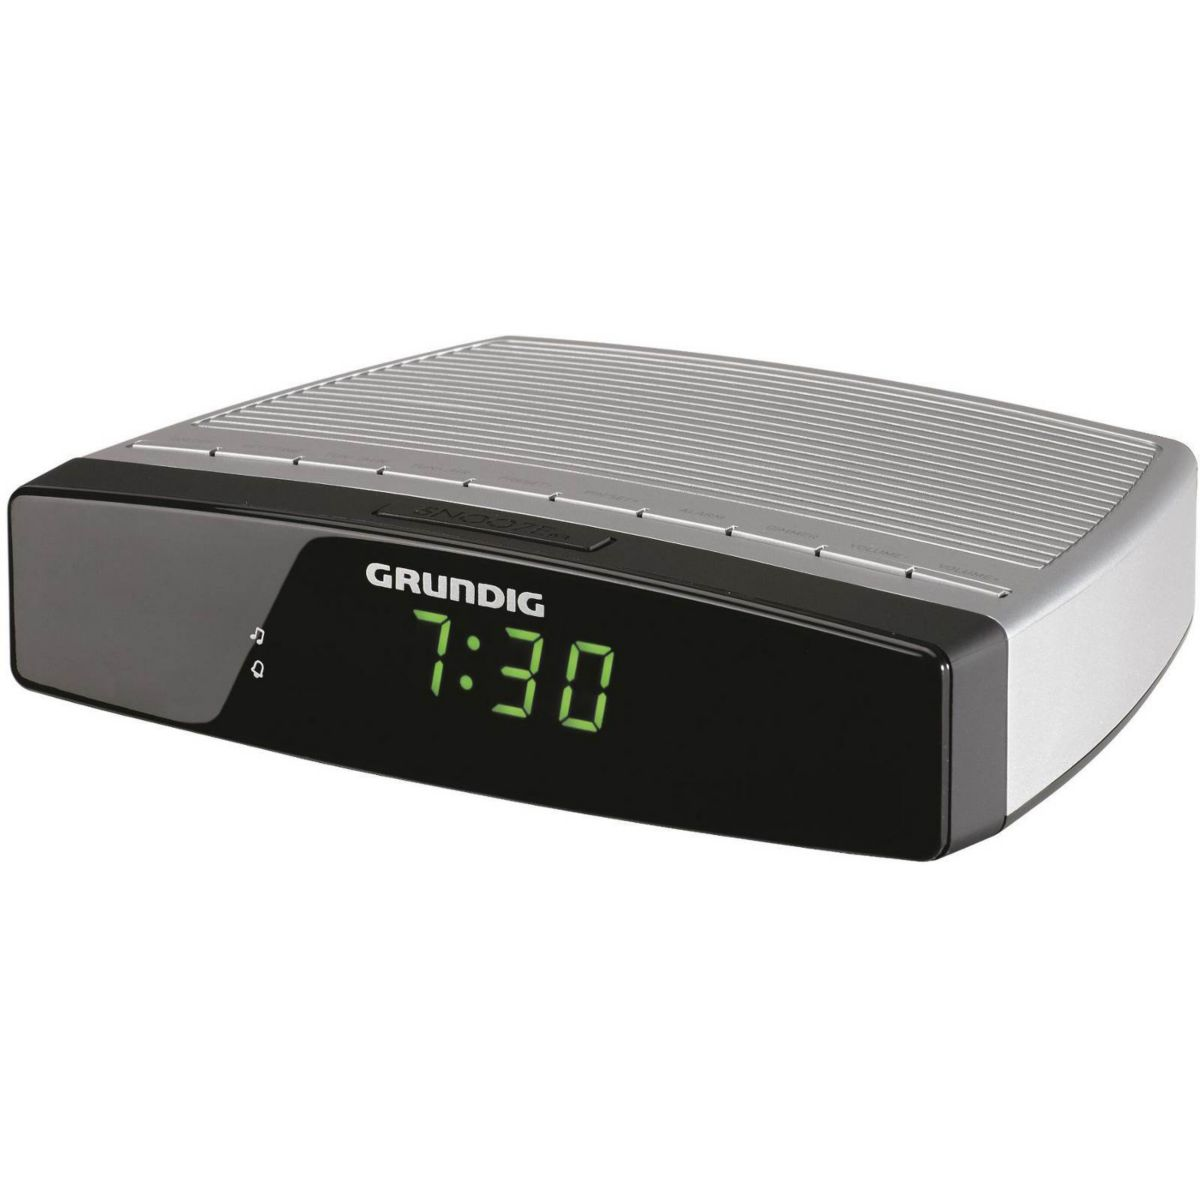 Radio-réveil GRUNDIG SC 600 (photo)